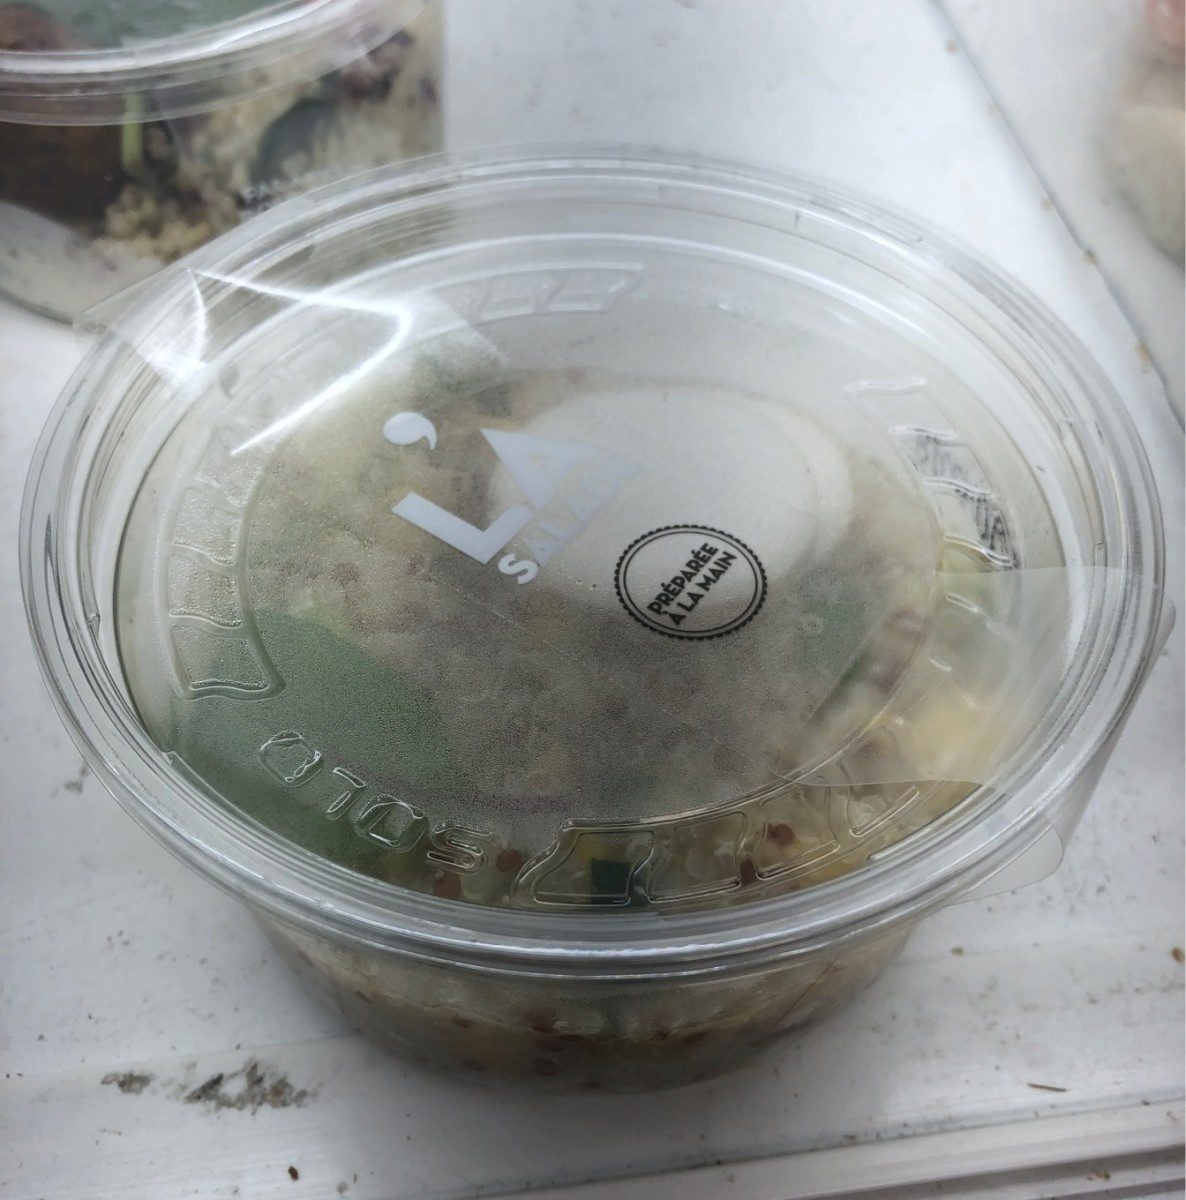 Salade Quinoa Chèvre - Product - fr